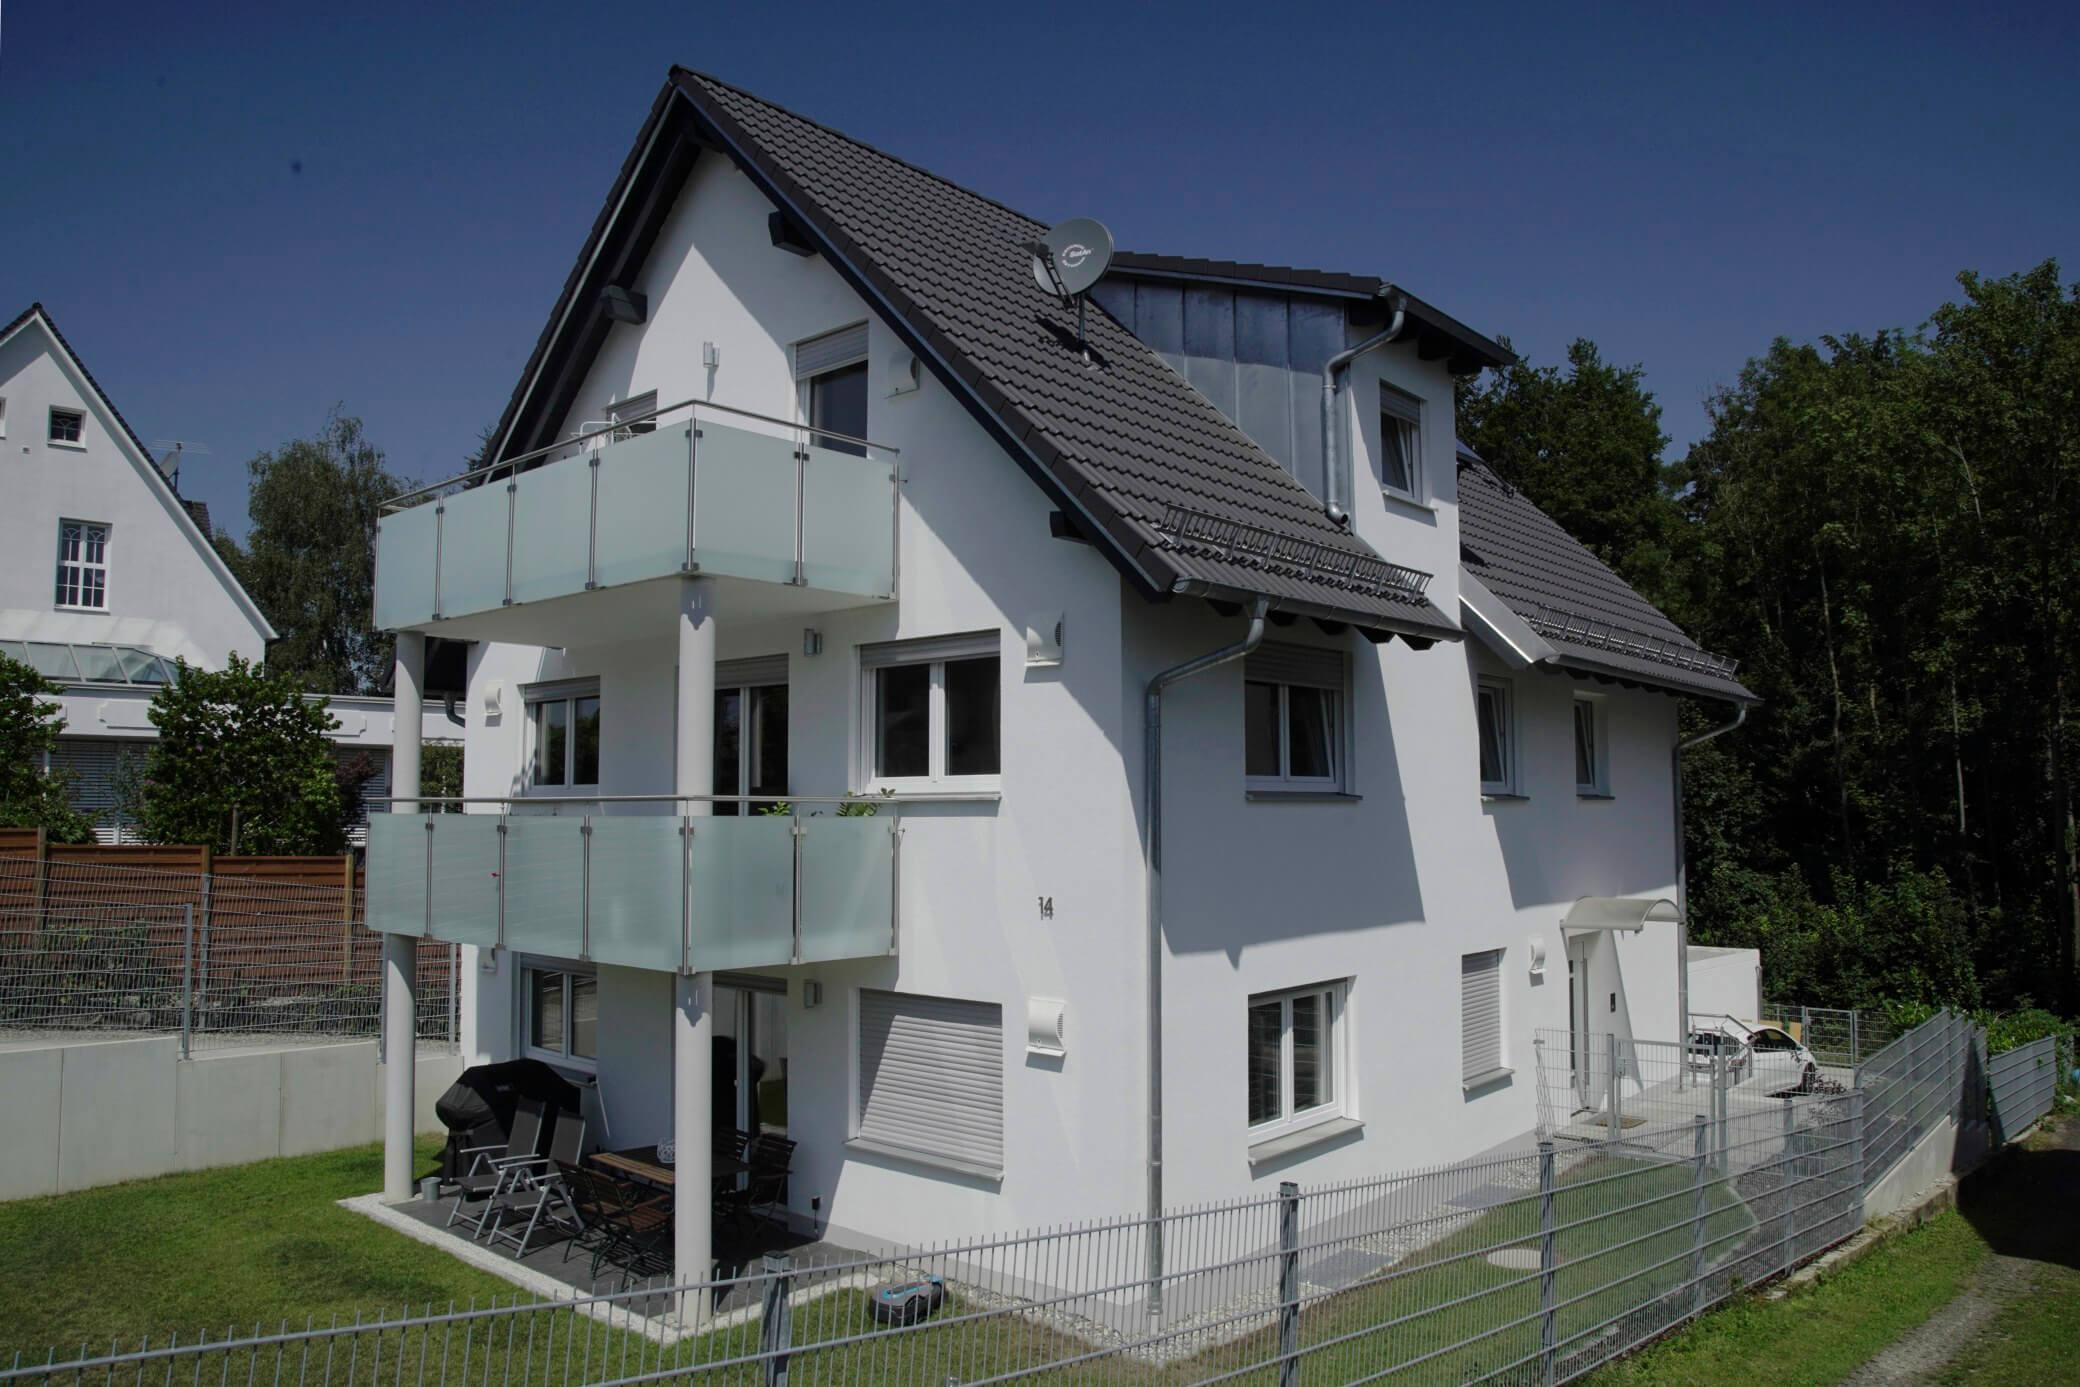 K&K Bau GmbH Massivhaus Referenzbild 30